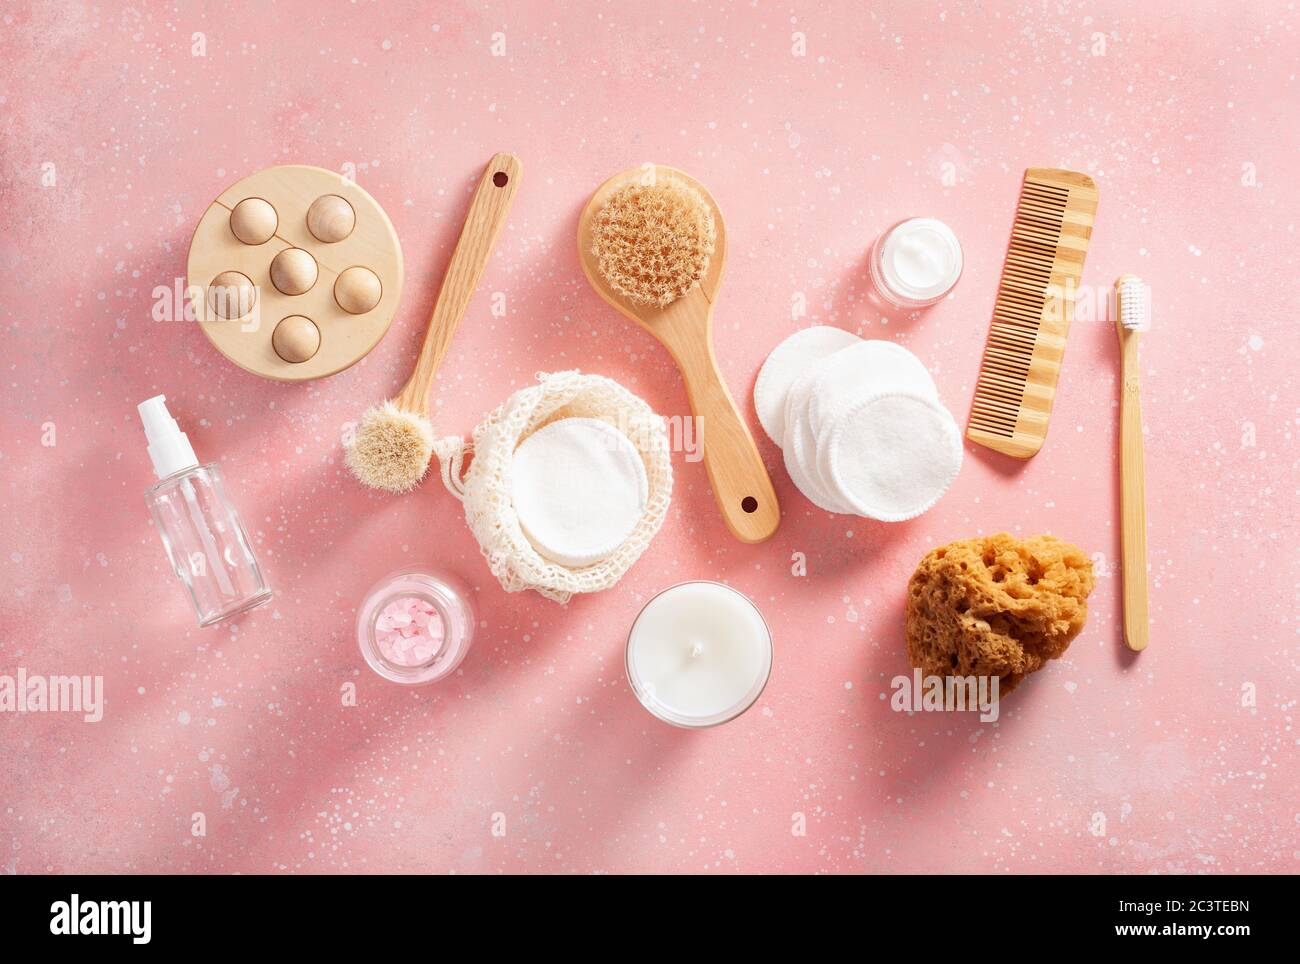 cero residuos eco concepto de higiene de baño. cepillo de madera jabón almohadillas reutilizables cepillo cosmético Foto de stock